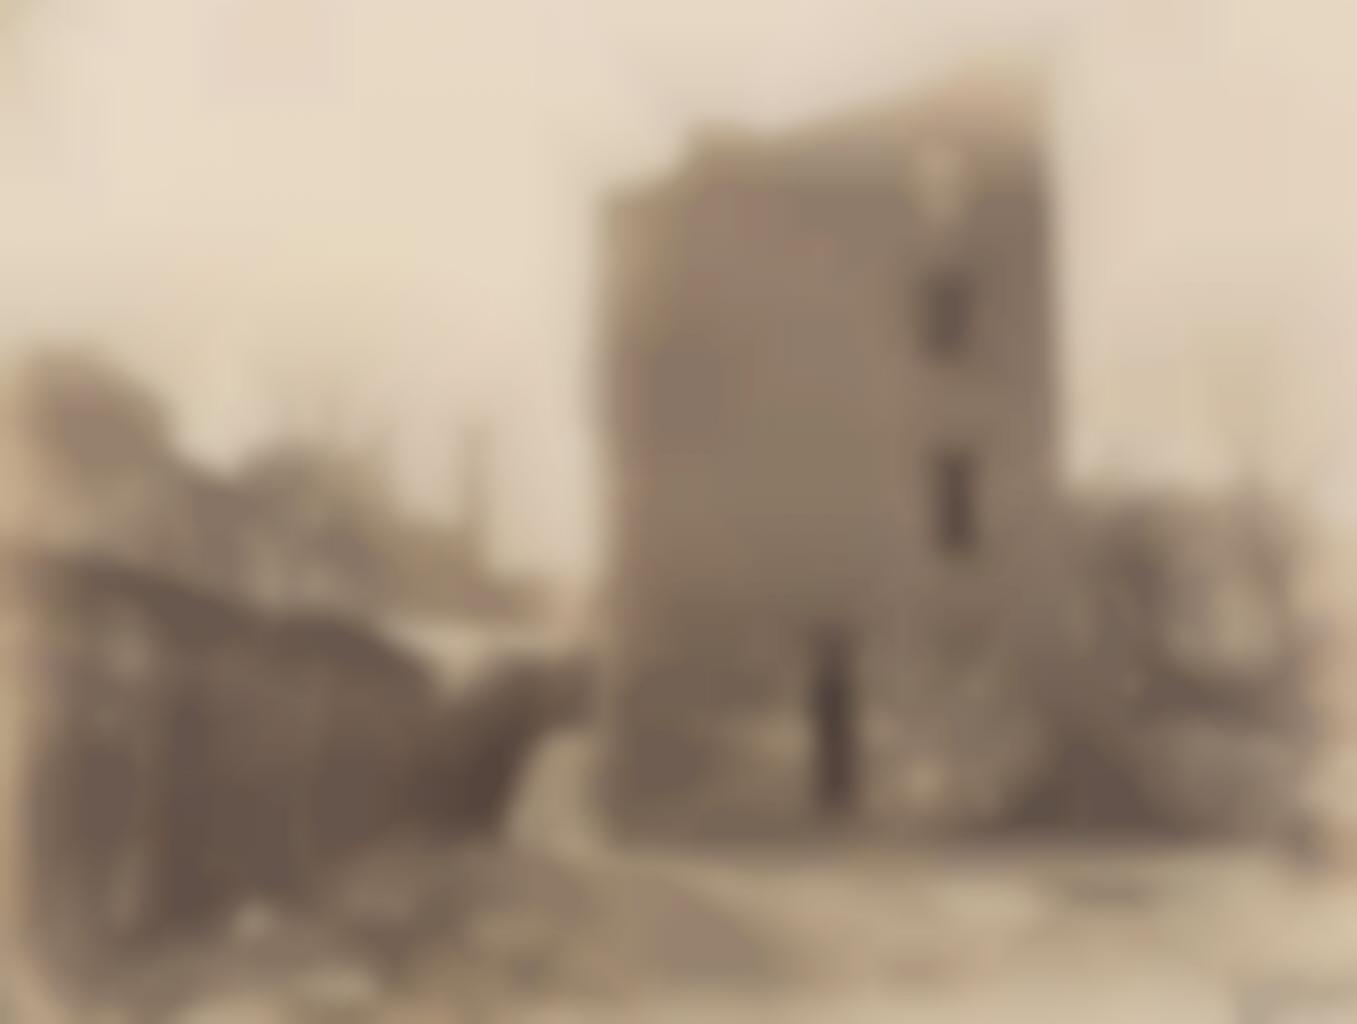 Eugene Atget-3 Ruelle des Reculettes, Paris-1920